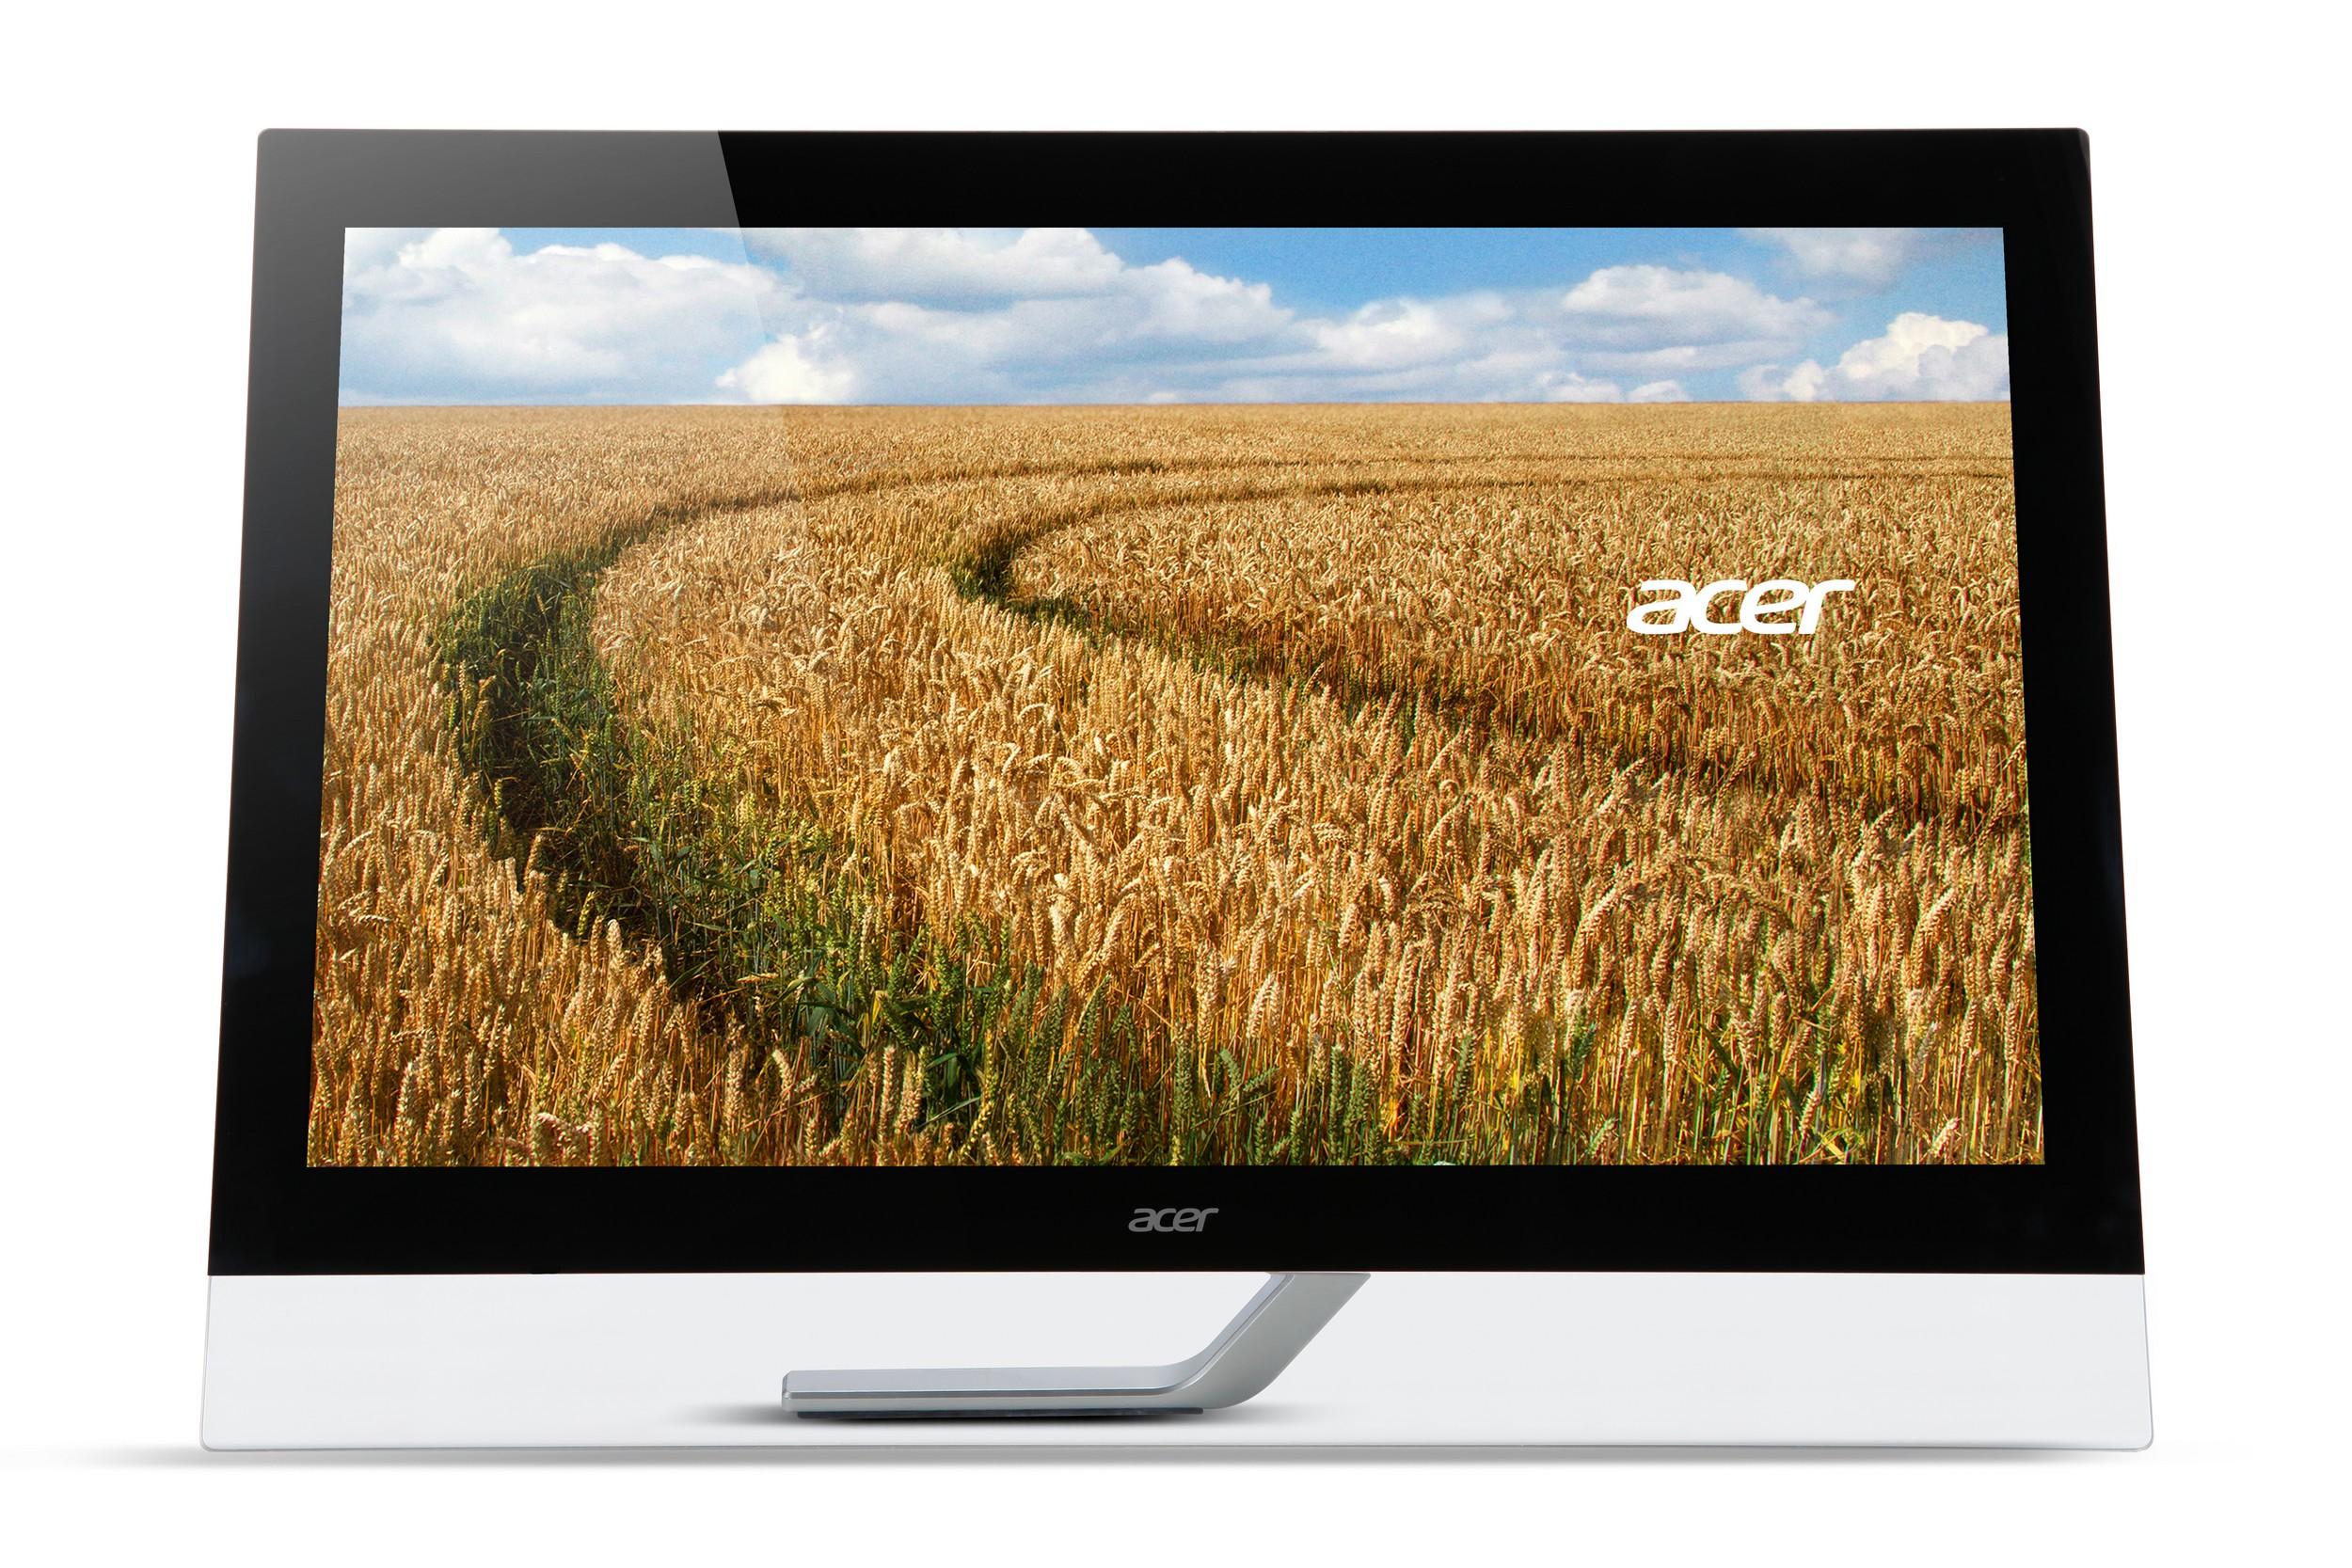 Acer T2 T272HULbmidpcz - 68,6 cm (27 Zoll) - 300 cd/m² - Full HD - 5 ms - 2560 x 1440 Pixel - IPS